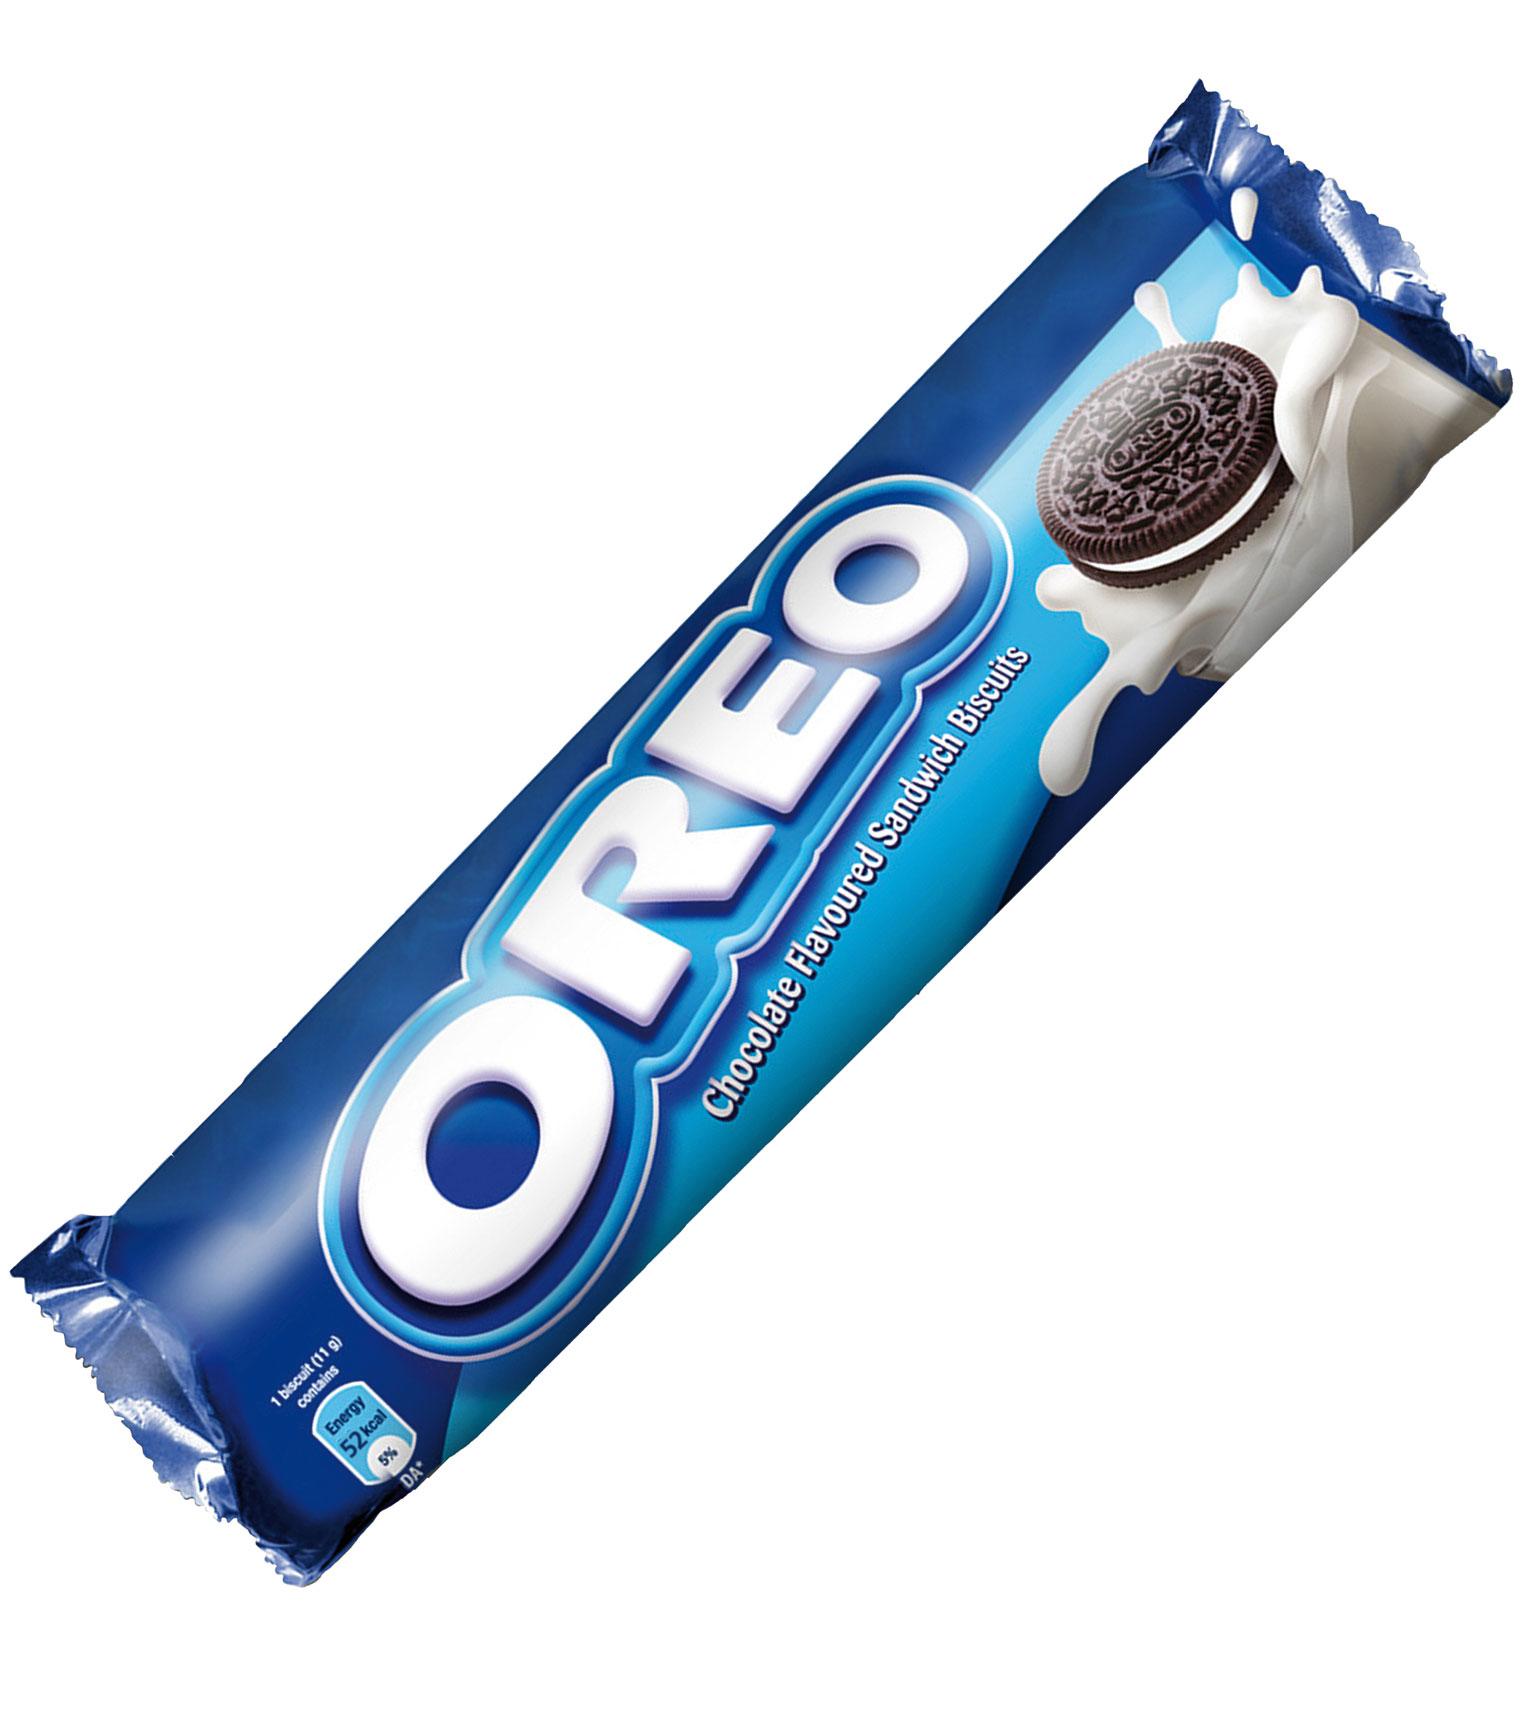 Oreo Original Sandwich Biscuits 154g 50p @ Sainsbury's